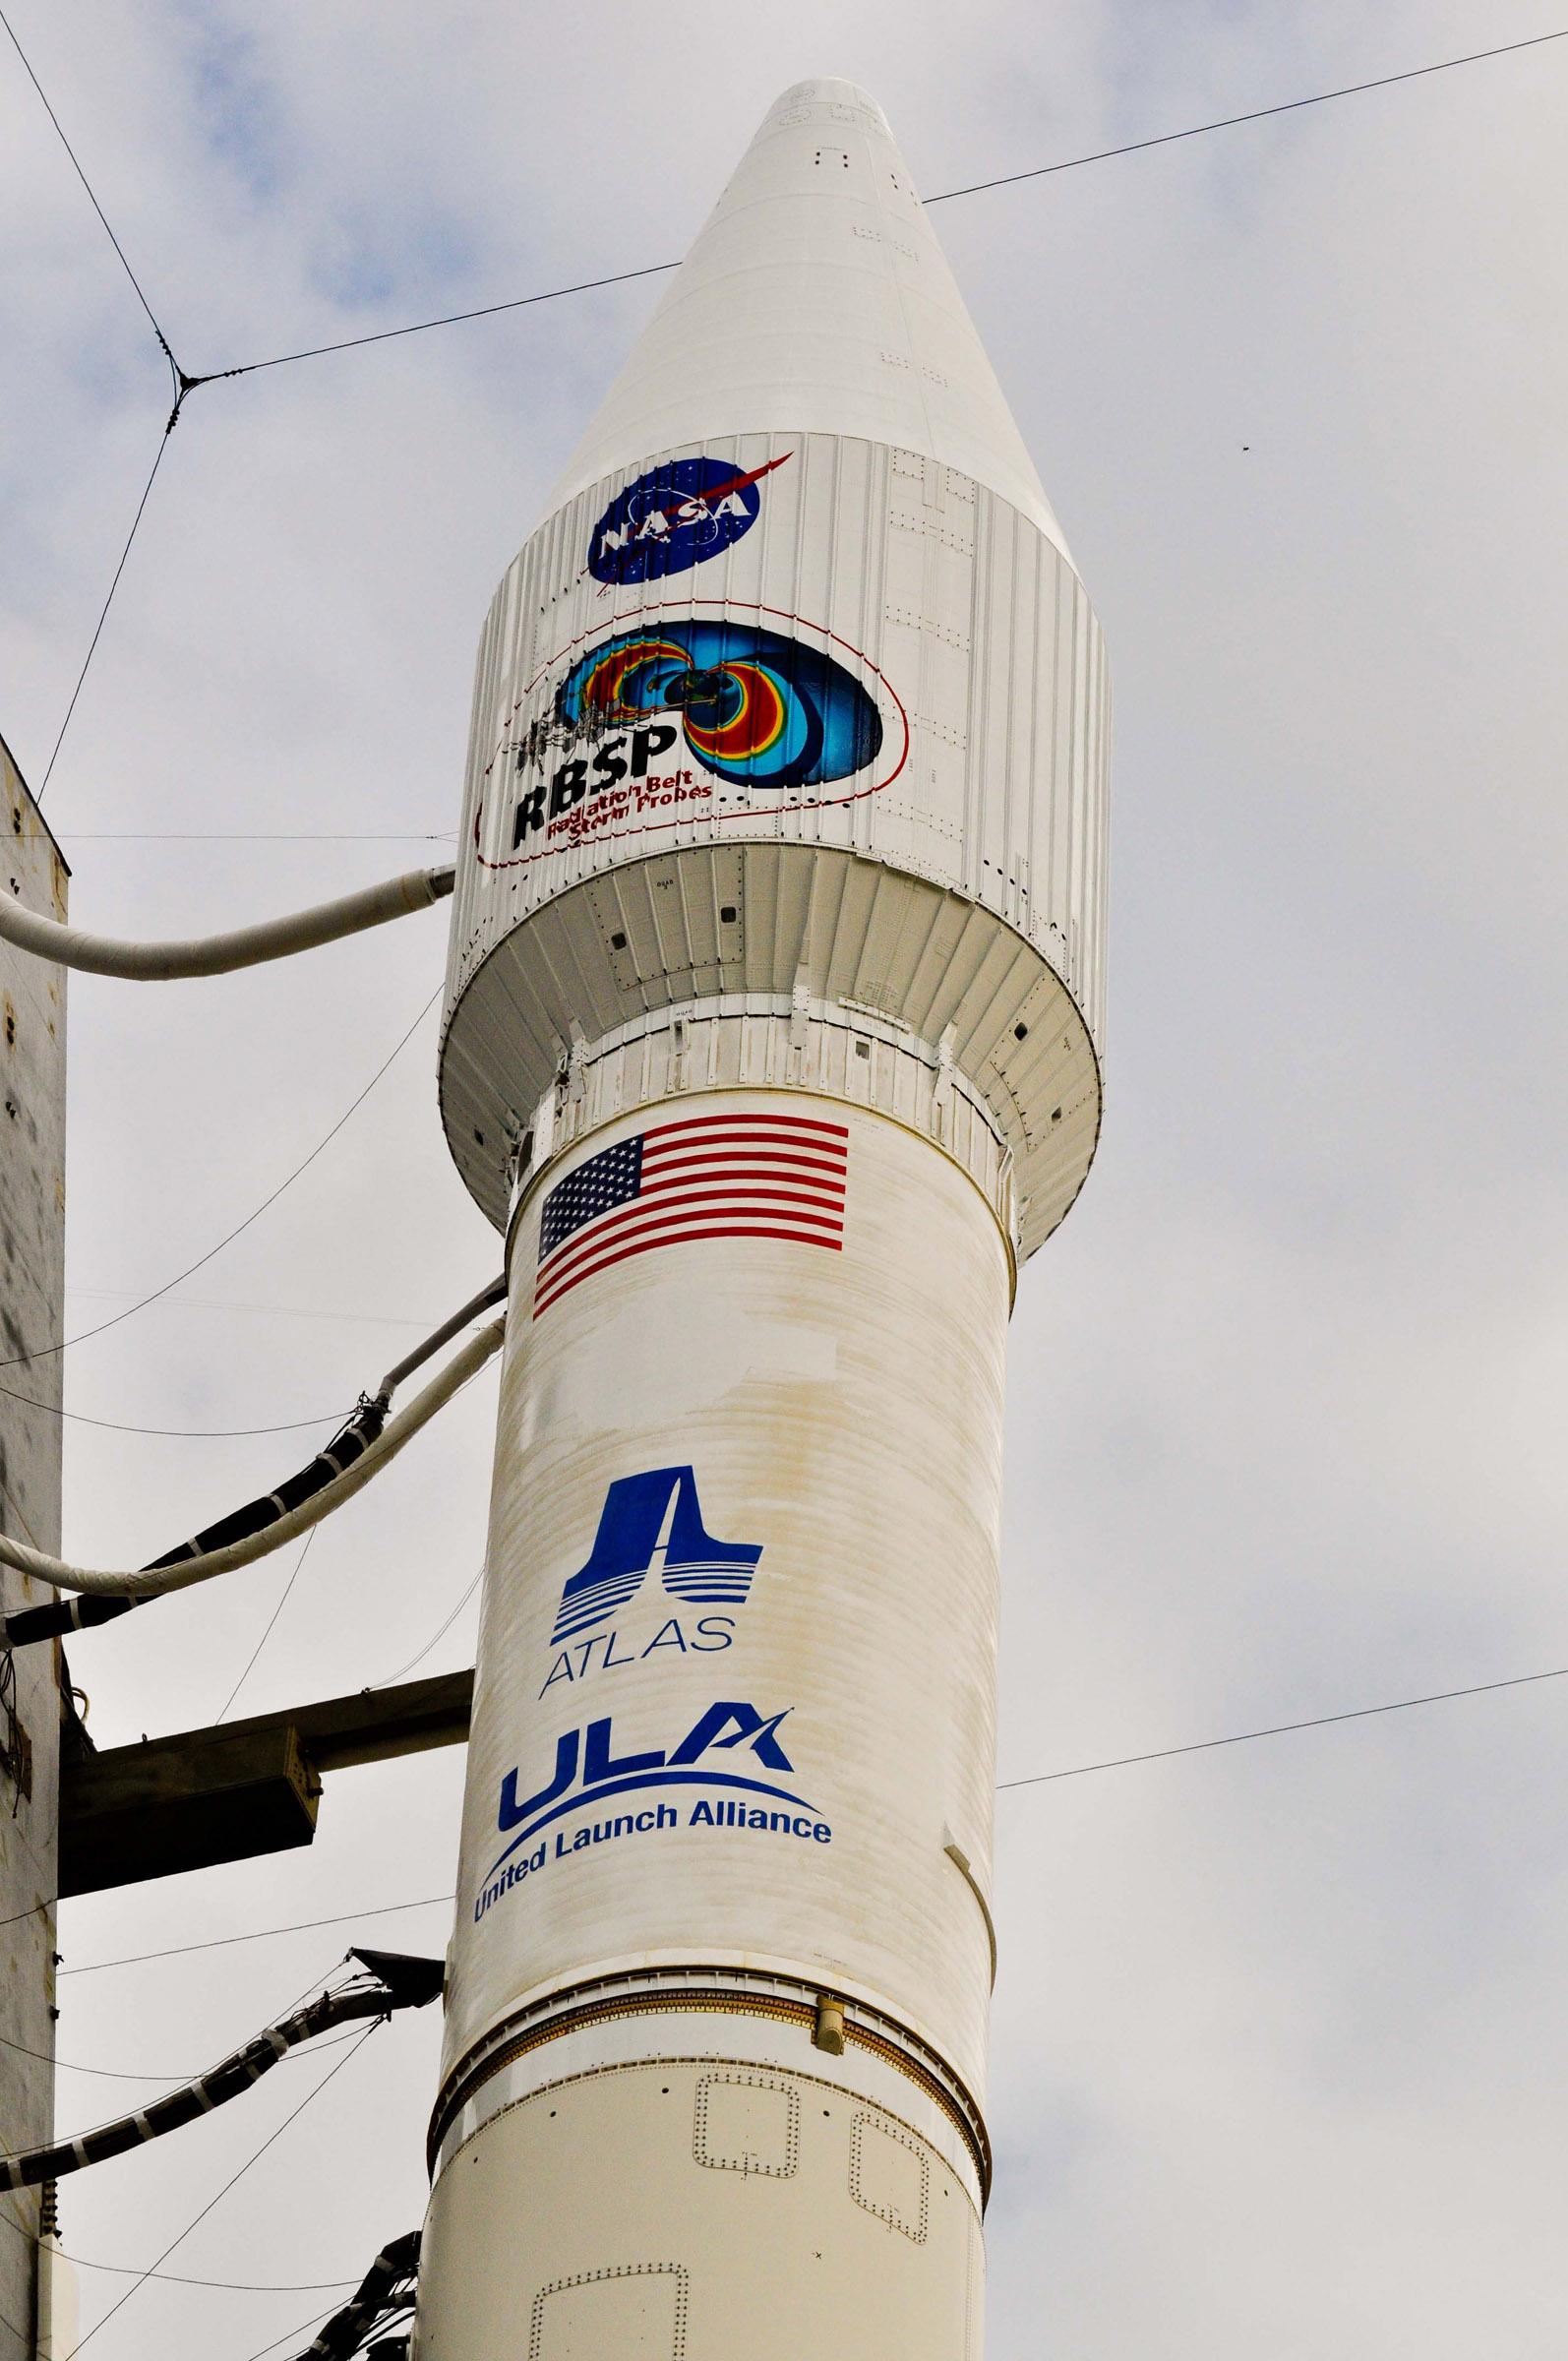 Top of Atlas V Rocket Carrying RBSP Satellite